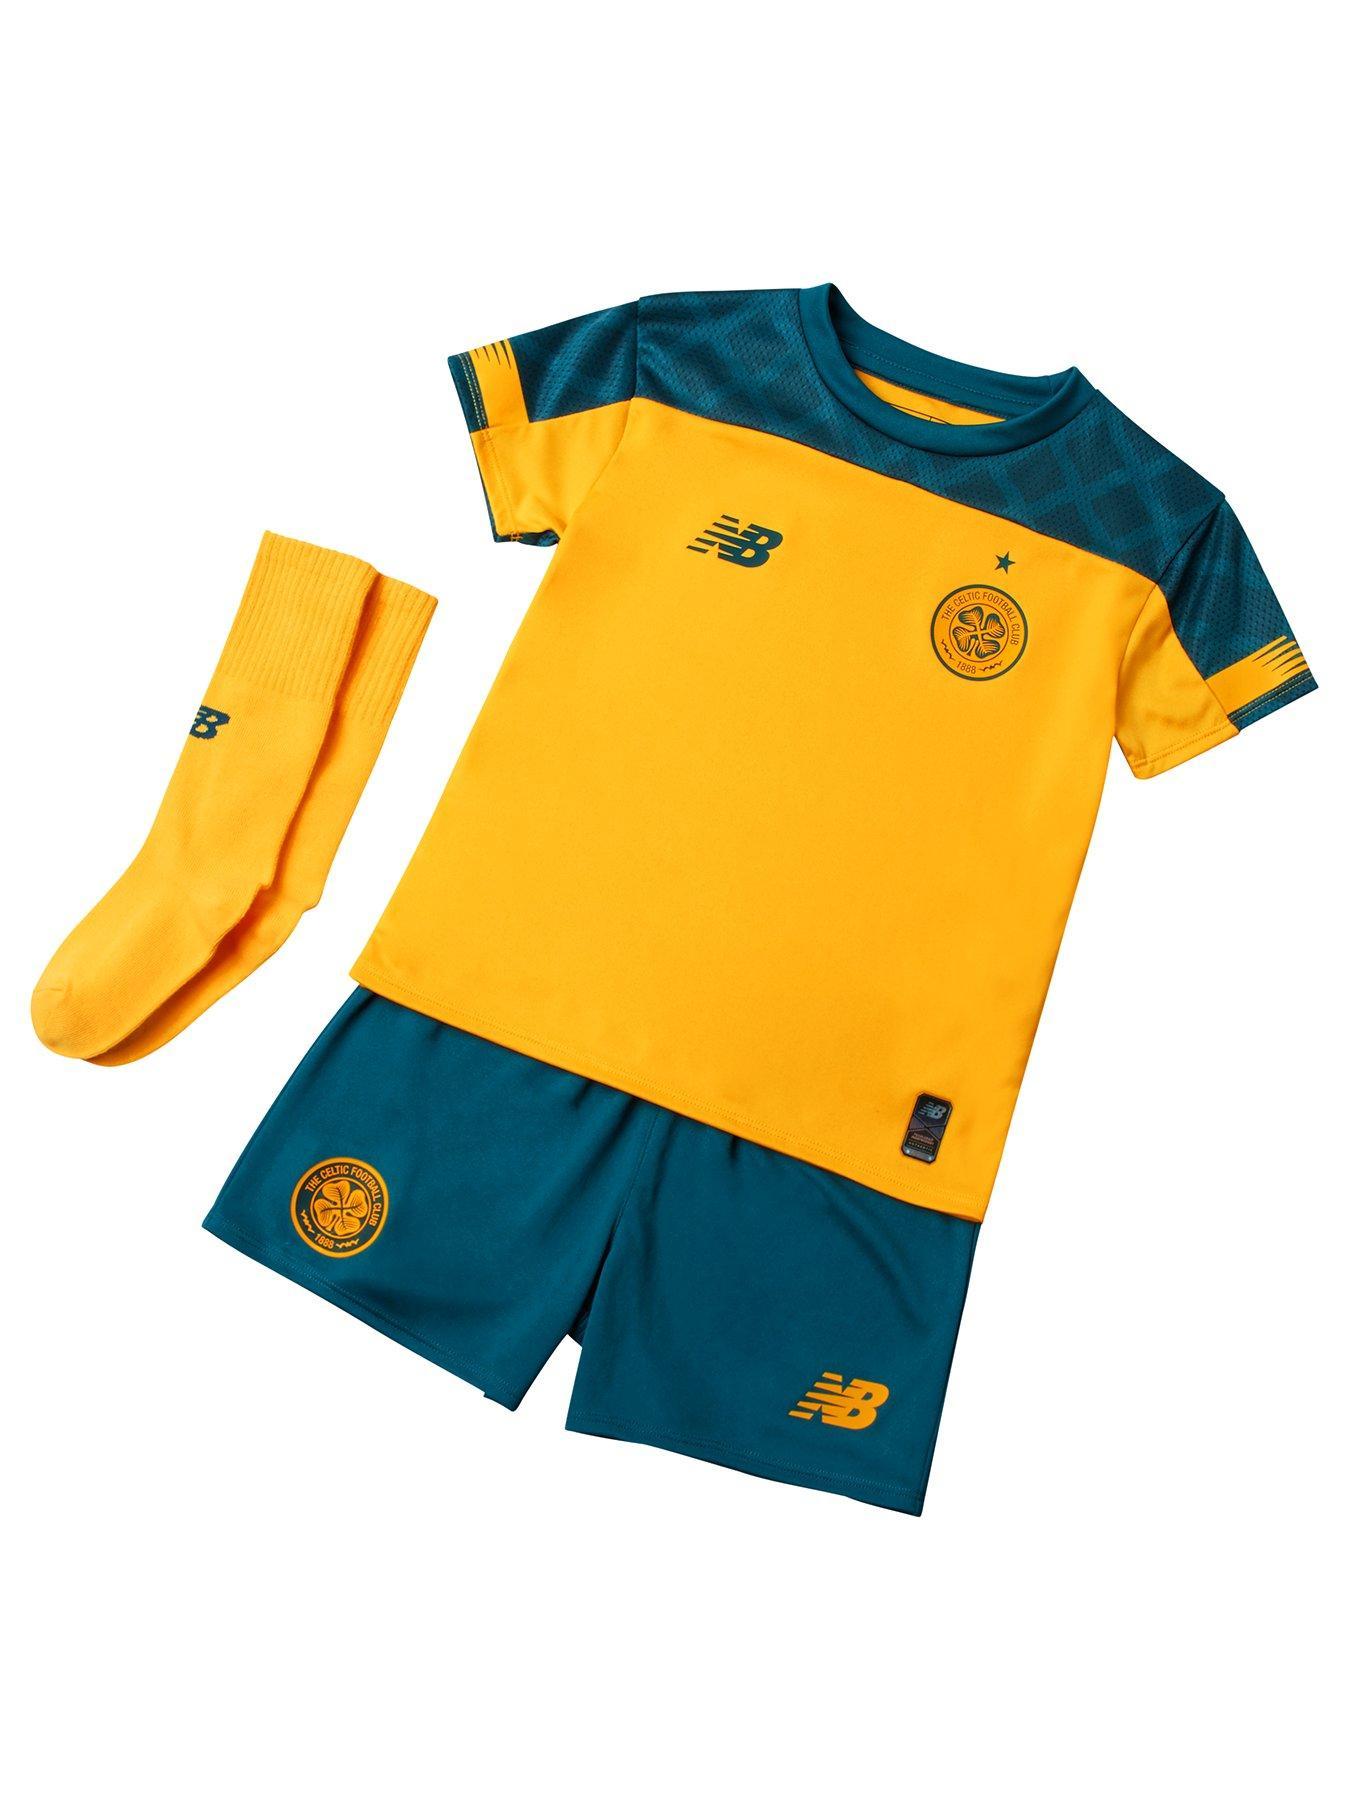 Celtic | Football shirts & kits | Sportswear | Child & baby